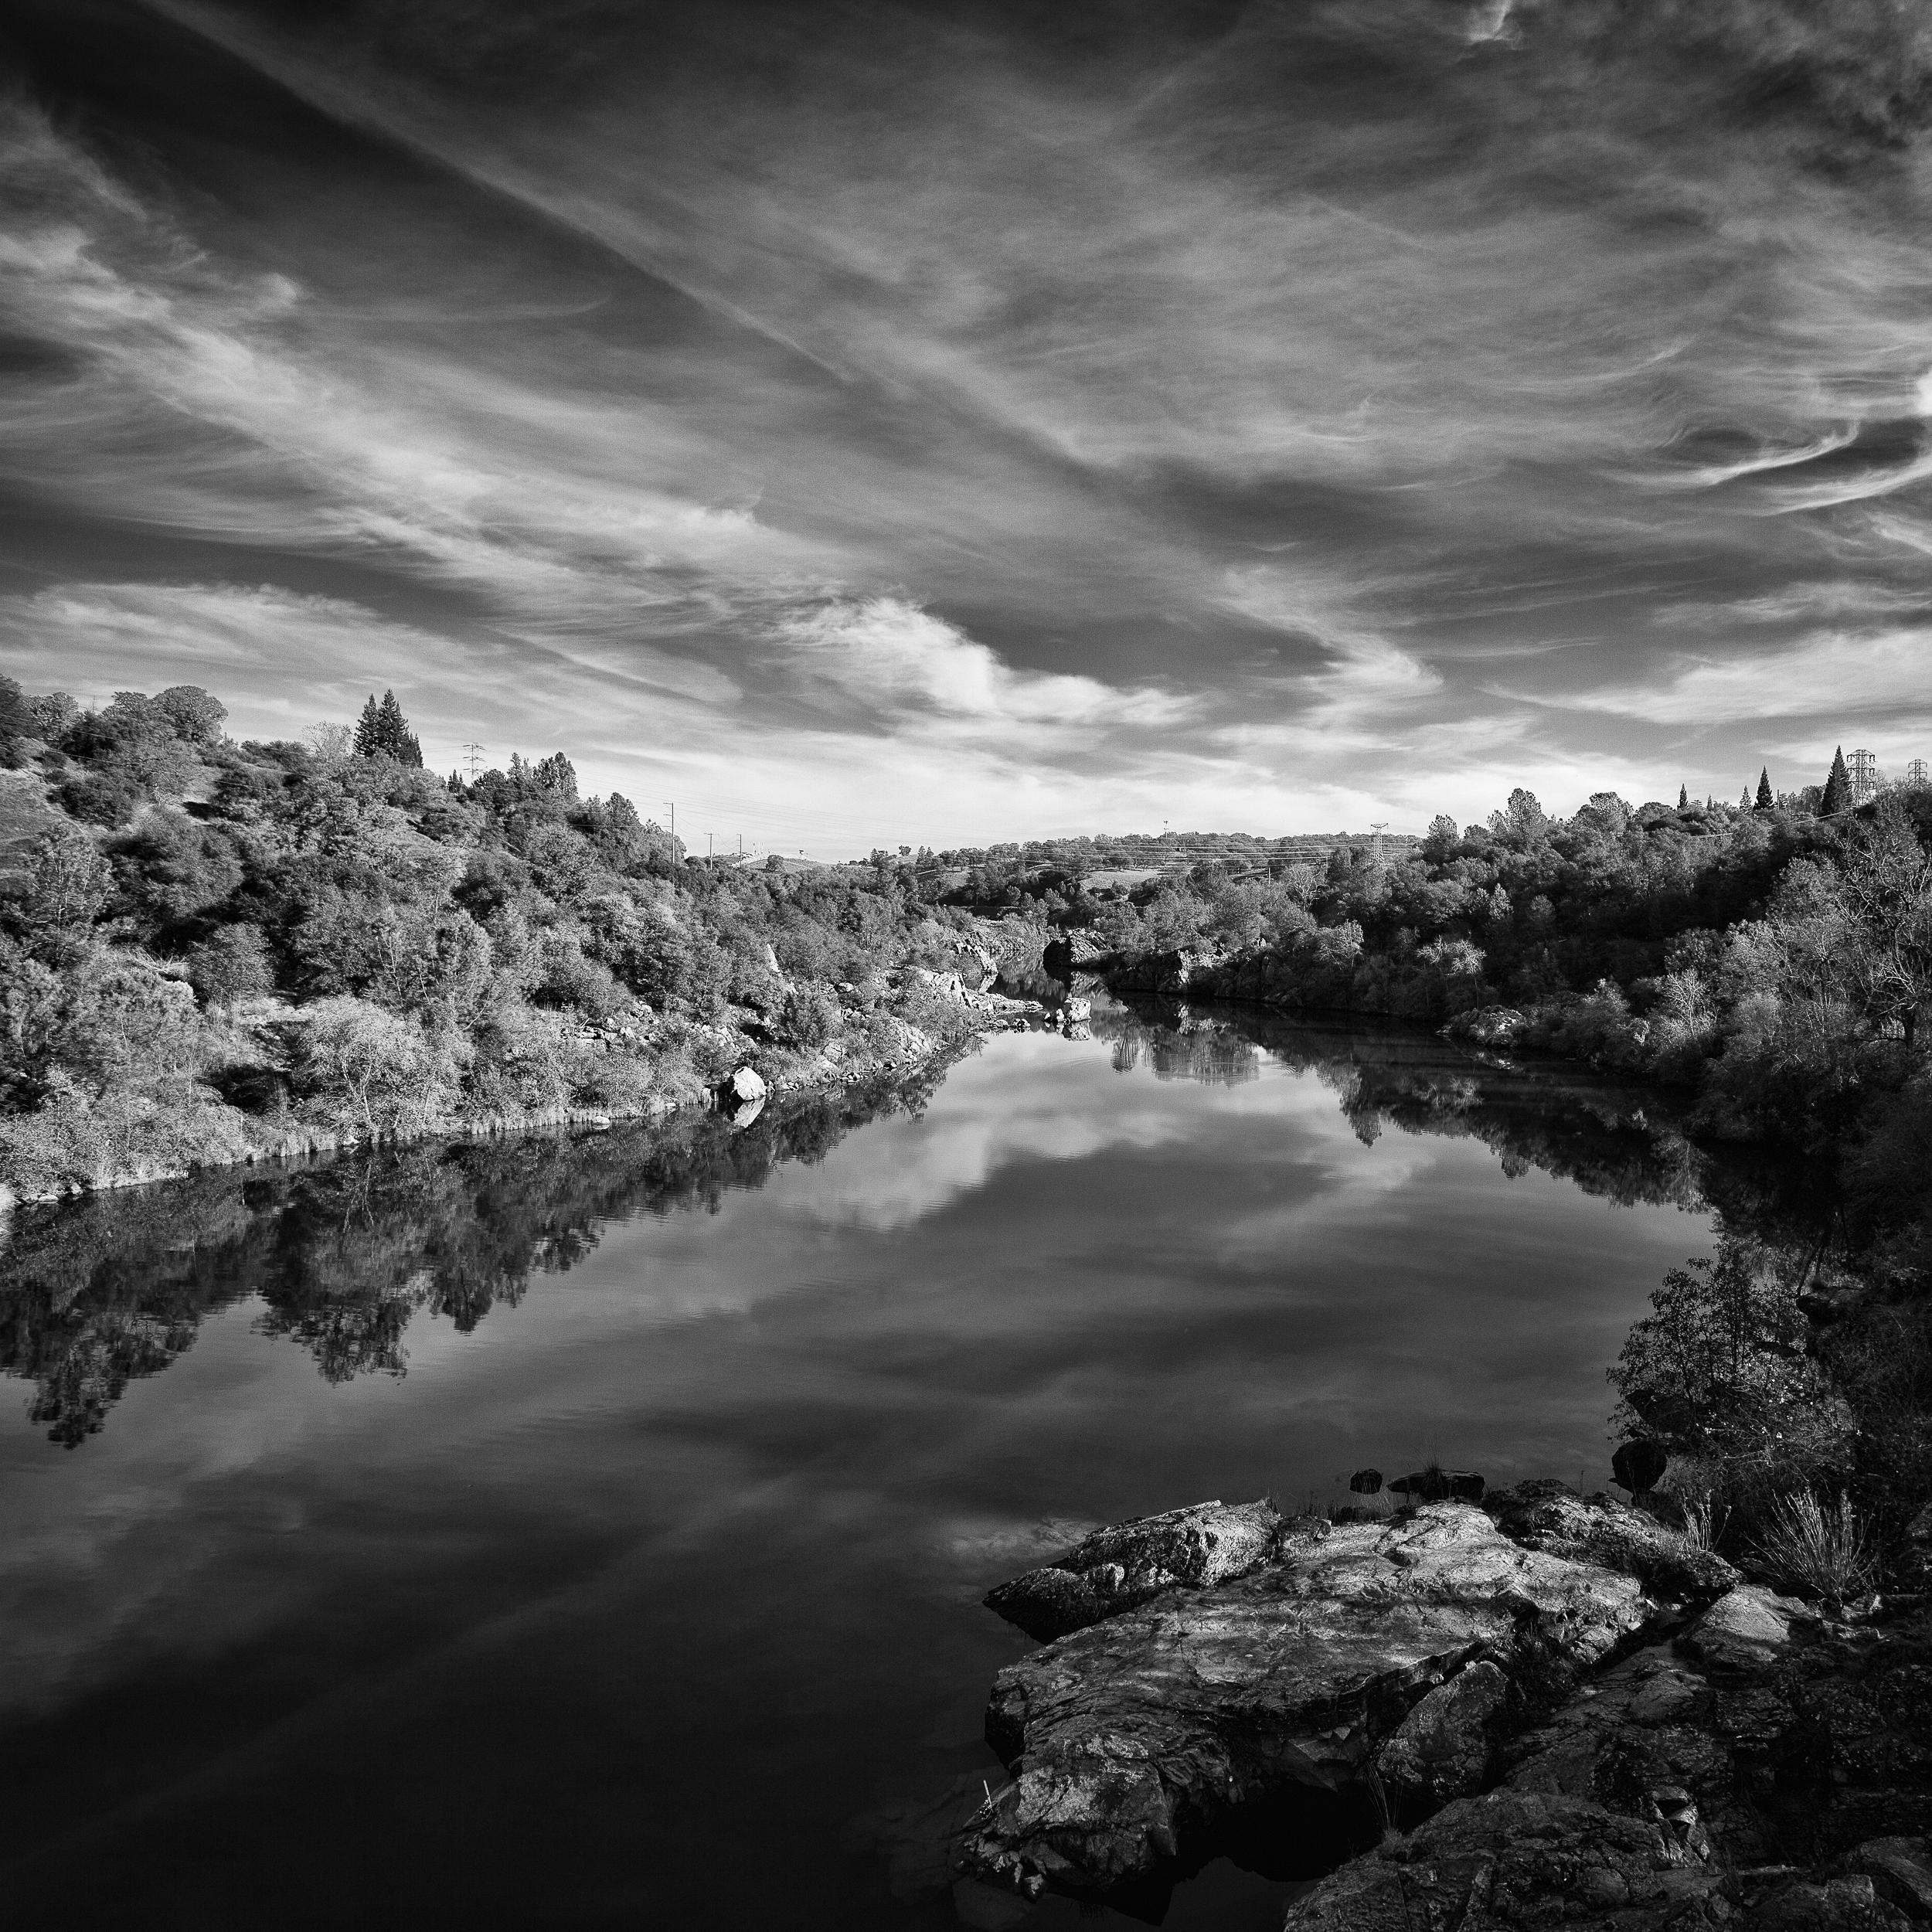 American River, Study 1